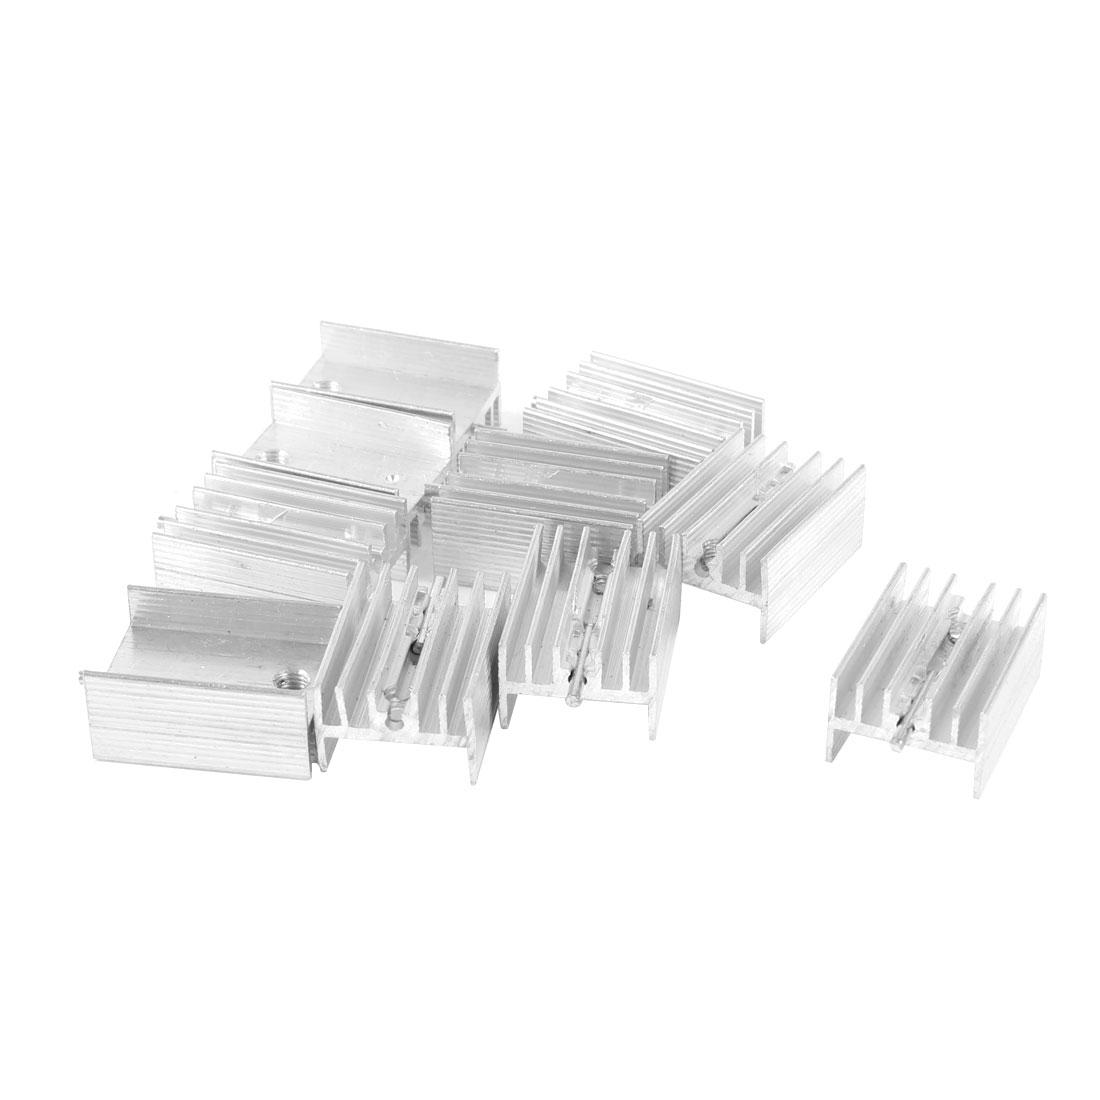 10pcs Aluminum Heatsink Cooling Fin 20mm x 15mm x 10mm for Power Transistor